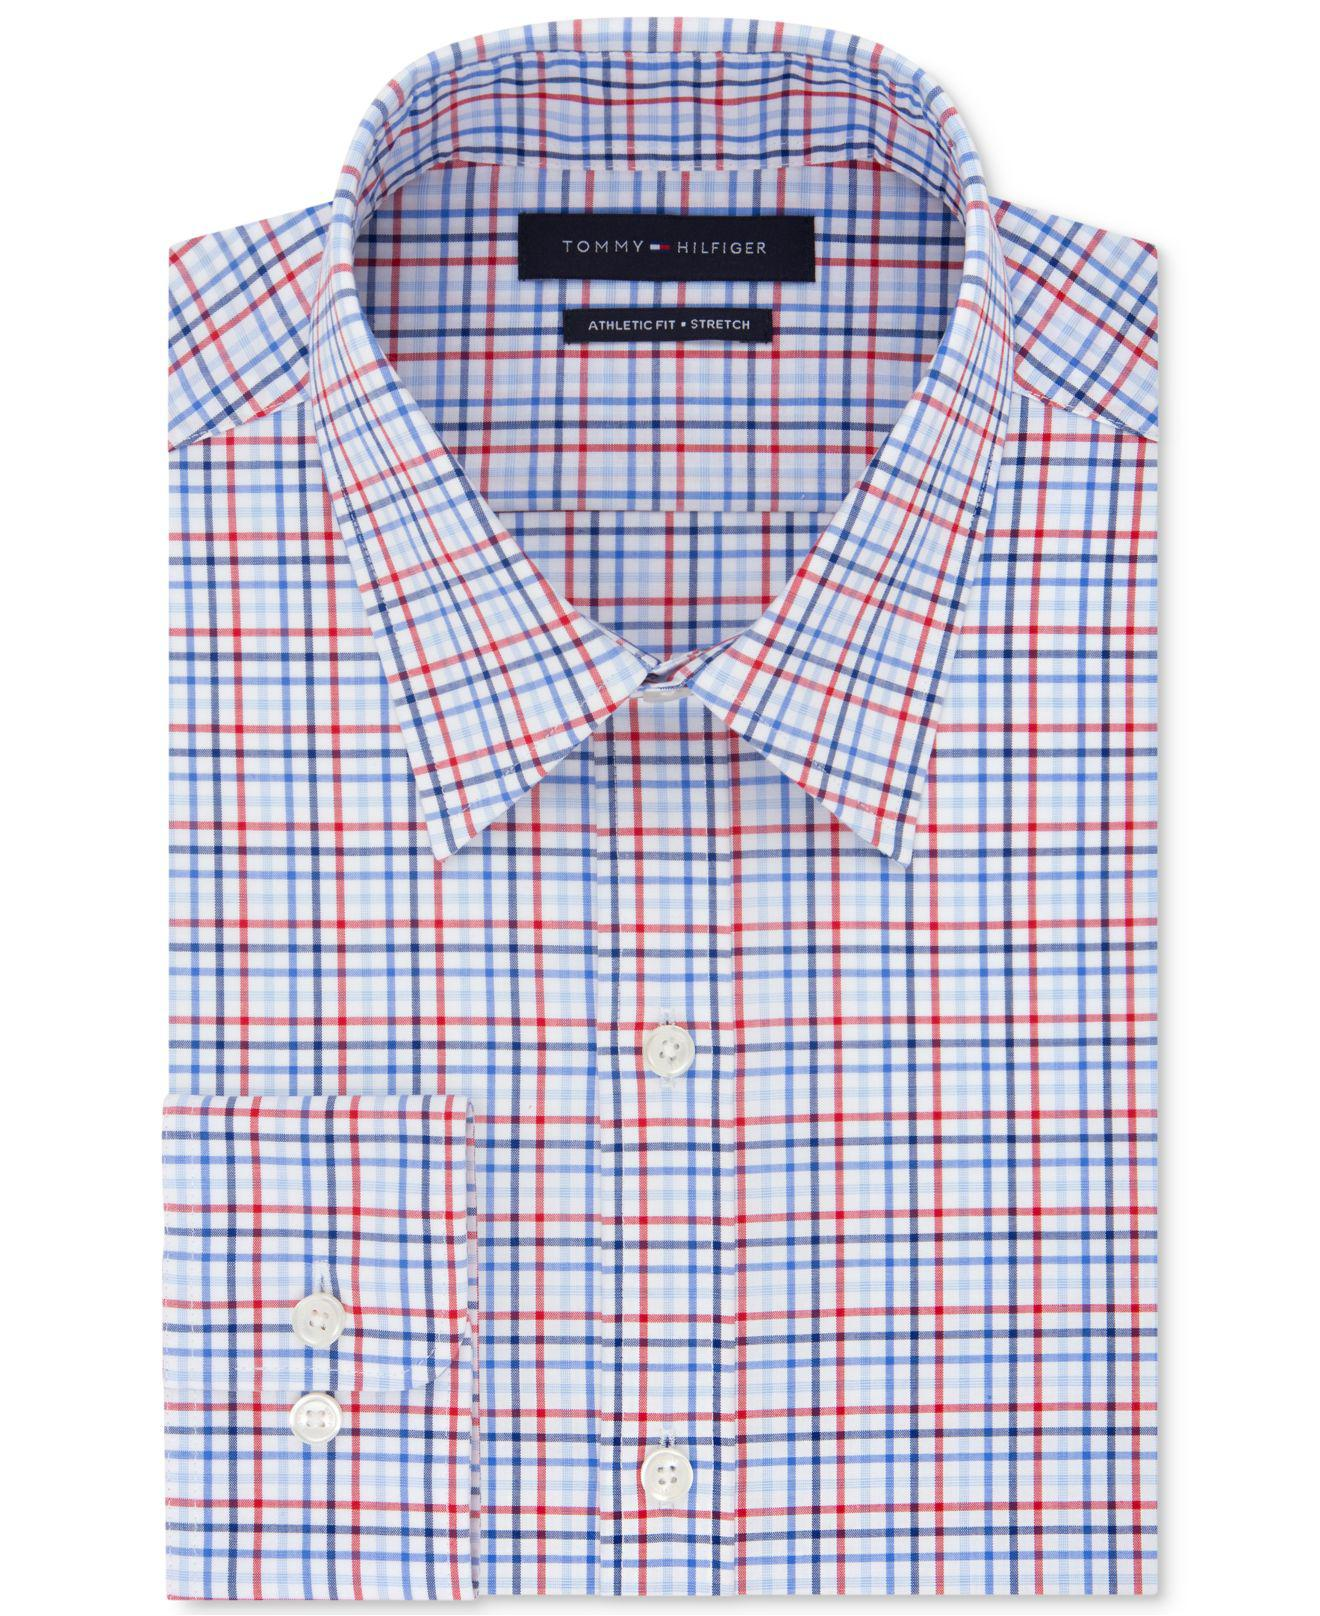 691aba412 Tommy Hilfiger Mens Athletic Fit Dress Shirt